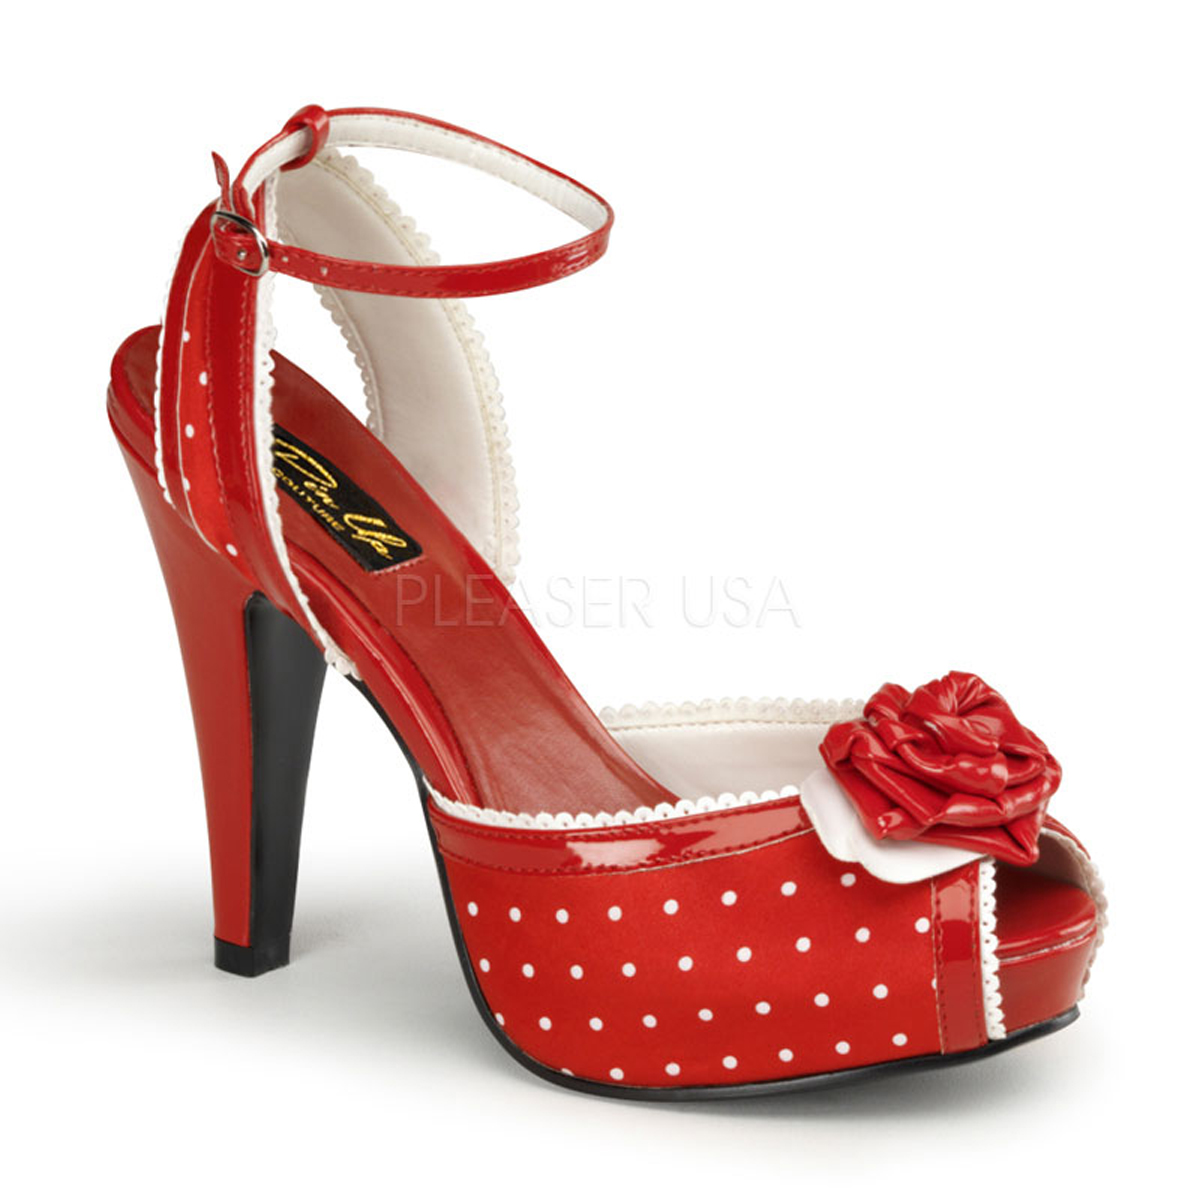 Sandales Pin Up satin rouge - Pointure : 39